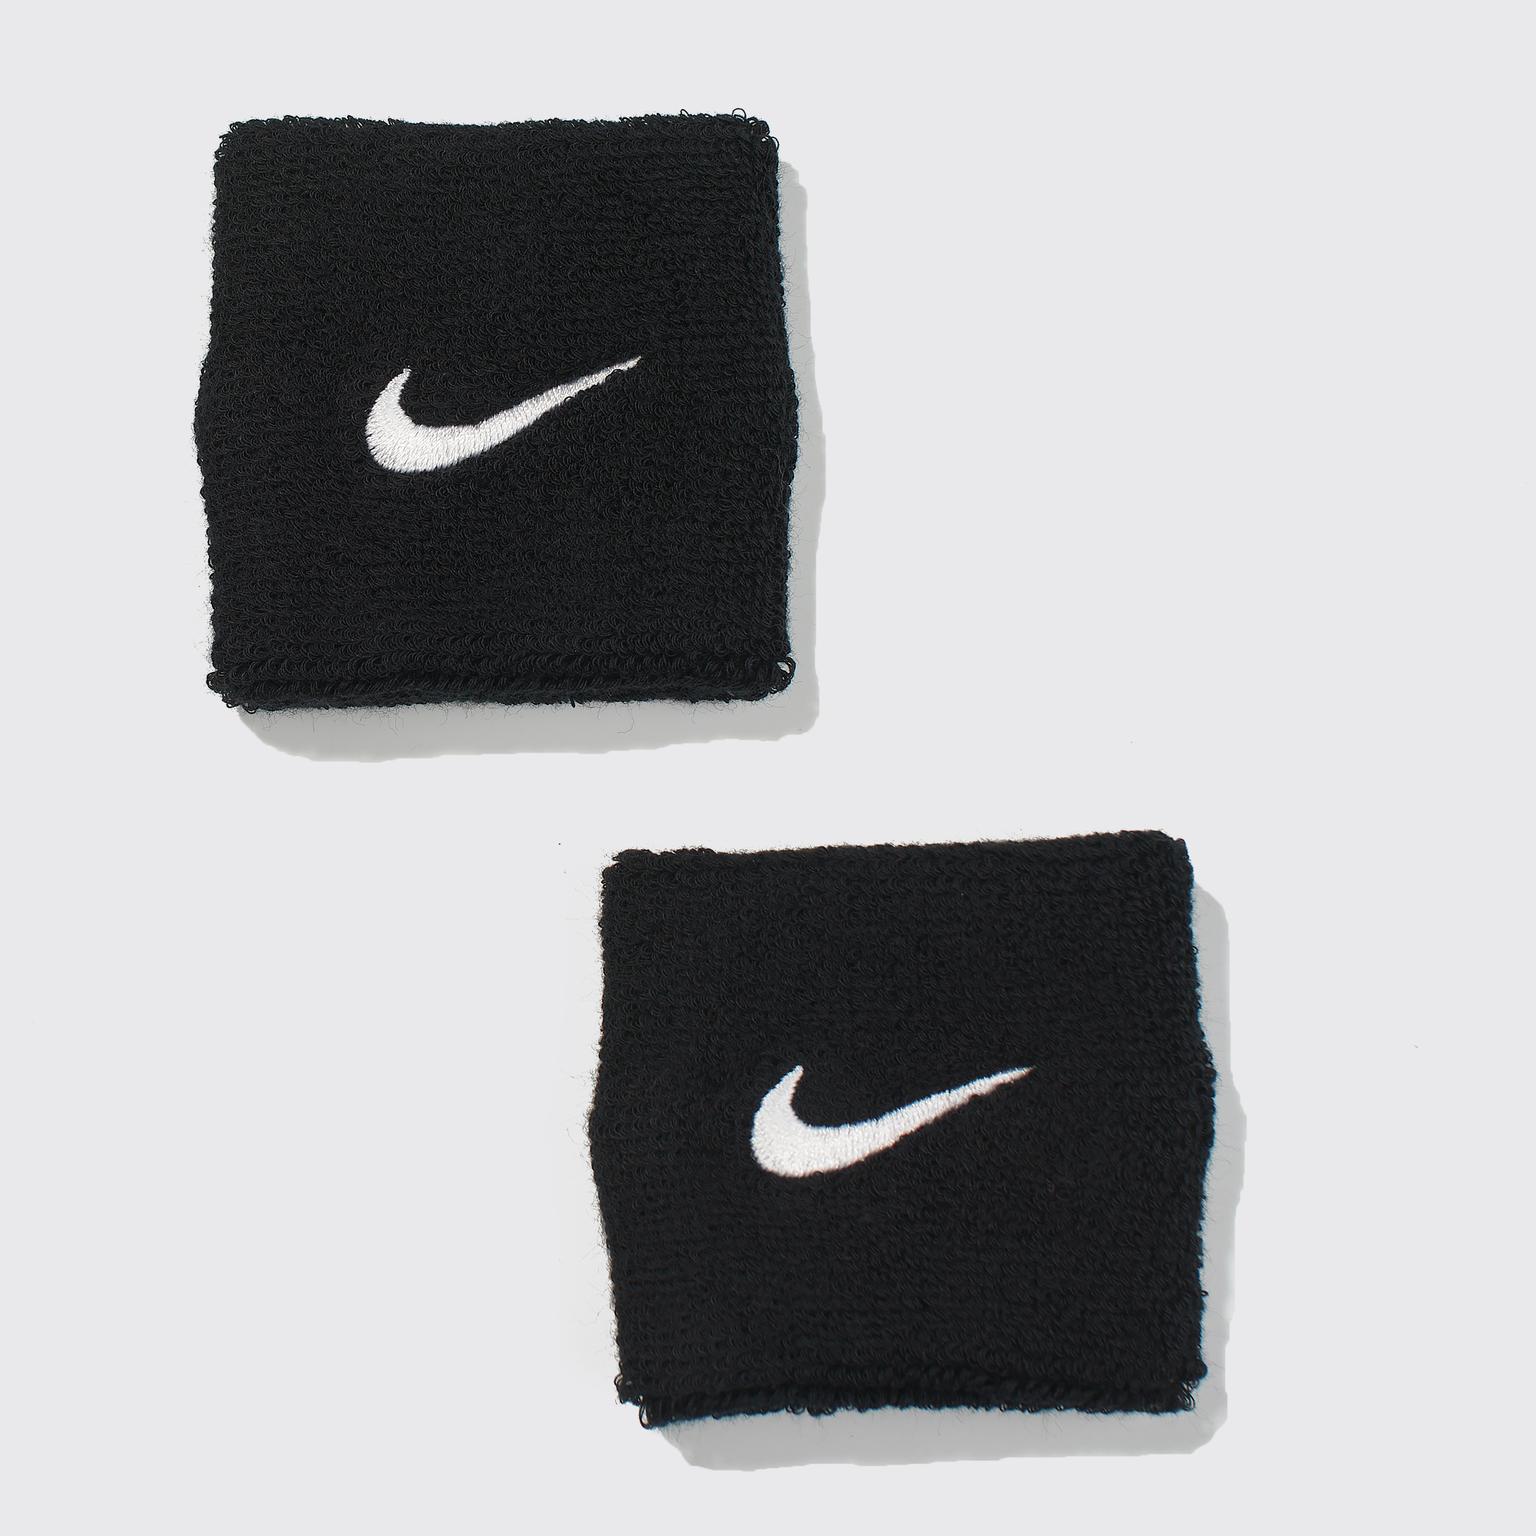 Повязки/Напульсники Nike Напульсник Nike Swoosh Wistbands